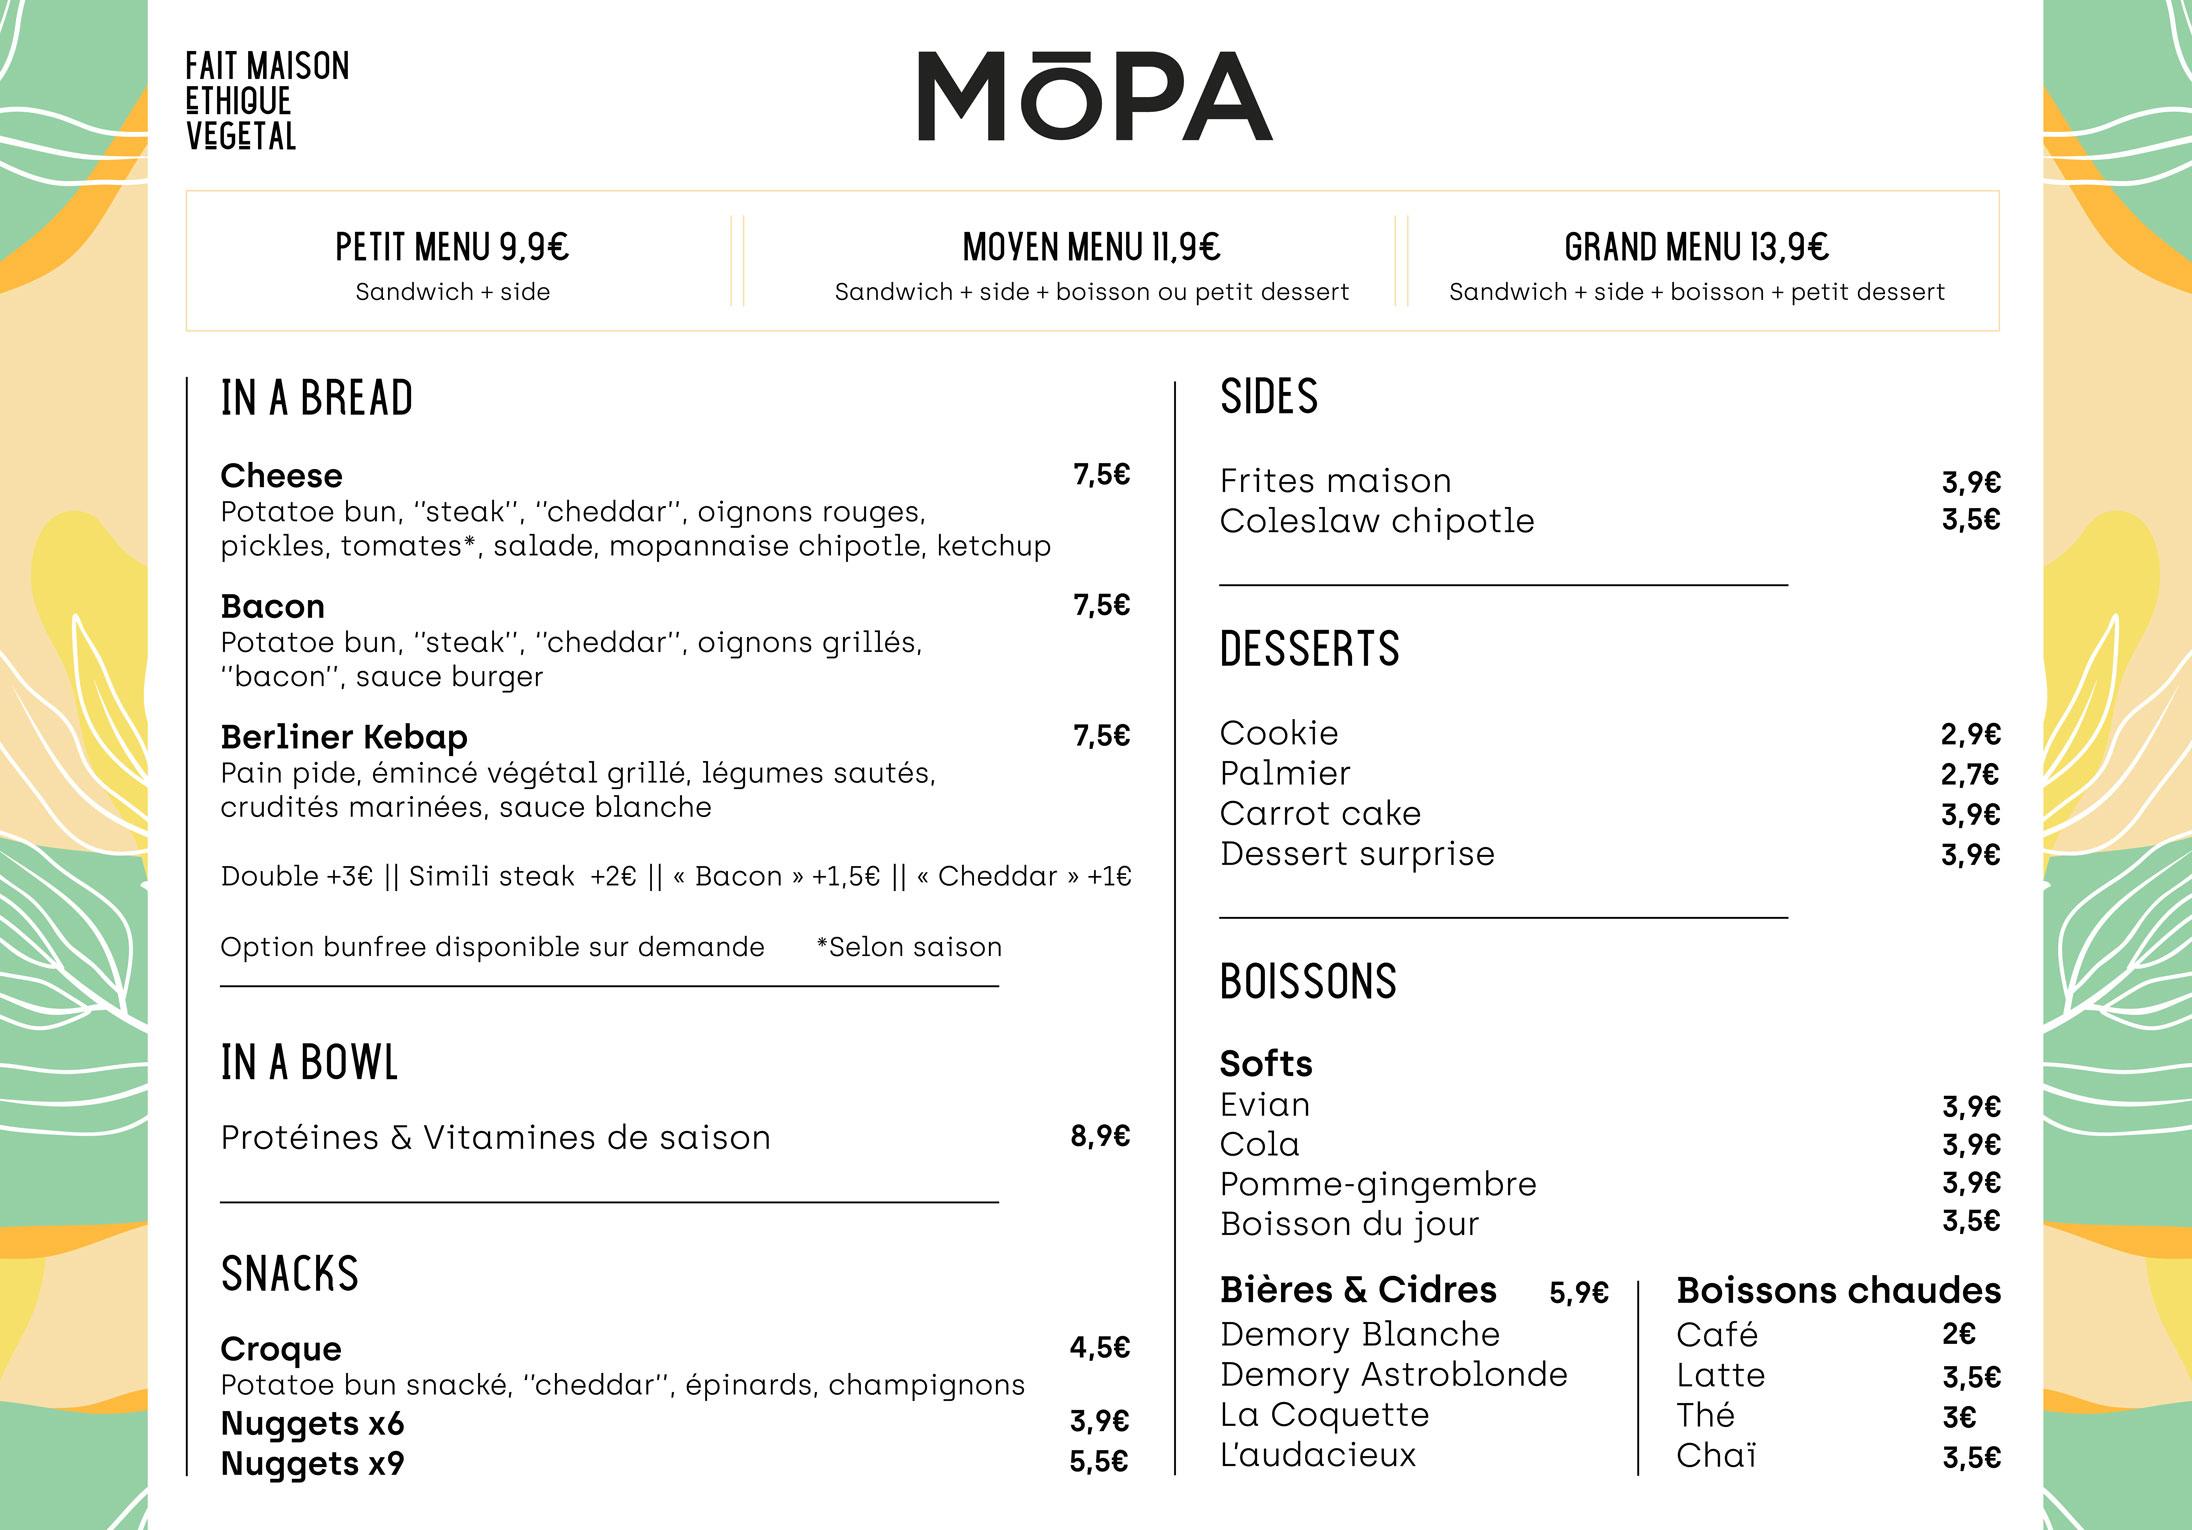 menu-mopa-restaurant-vegan-paris-75002